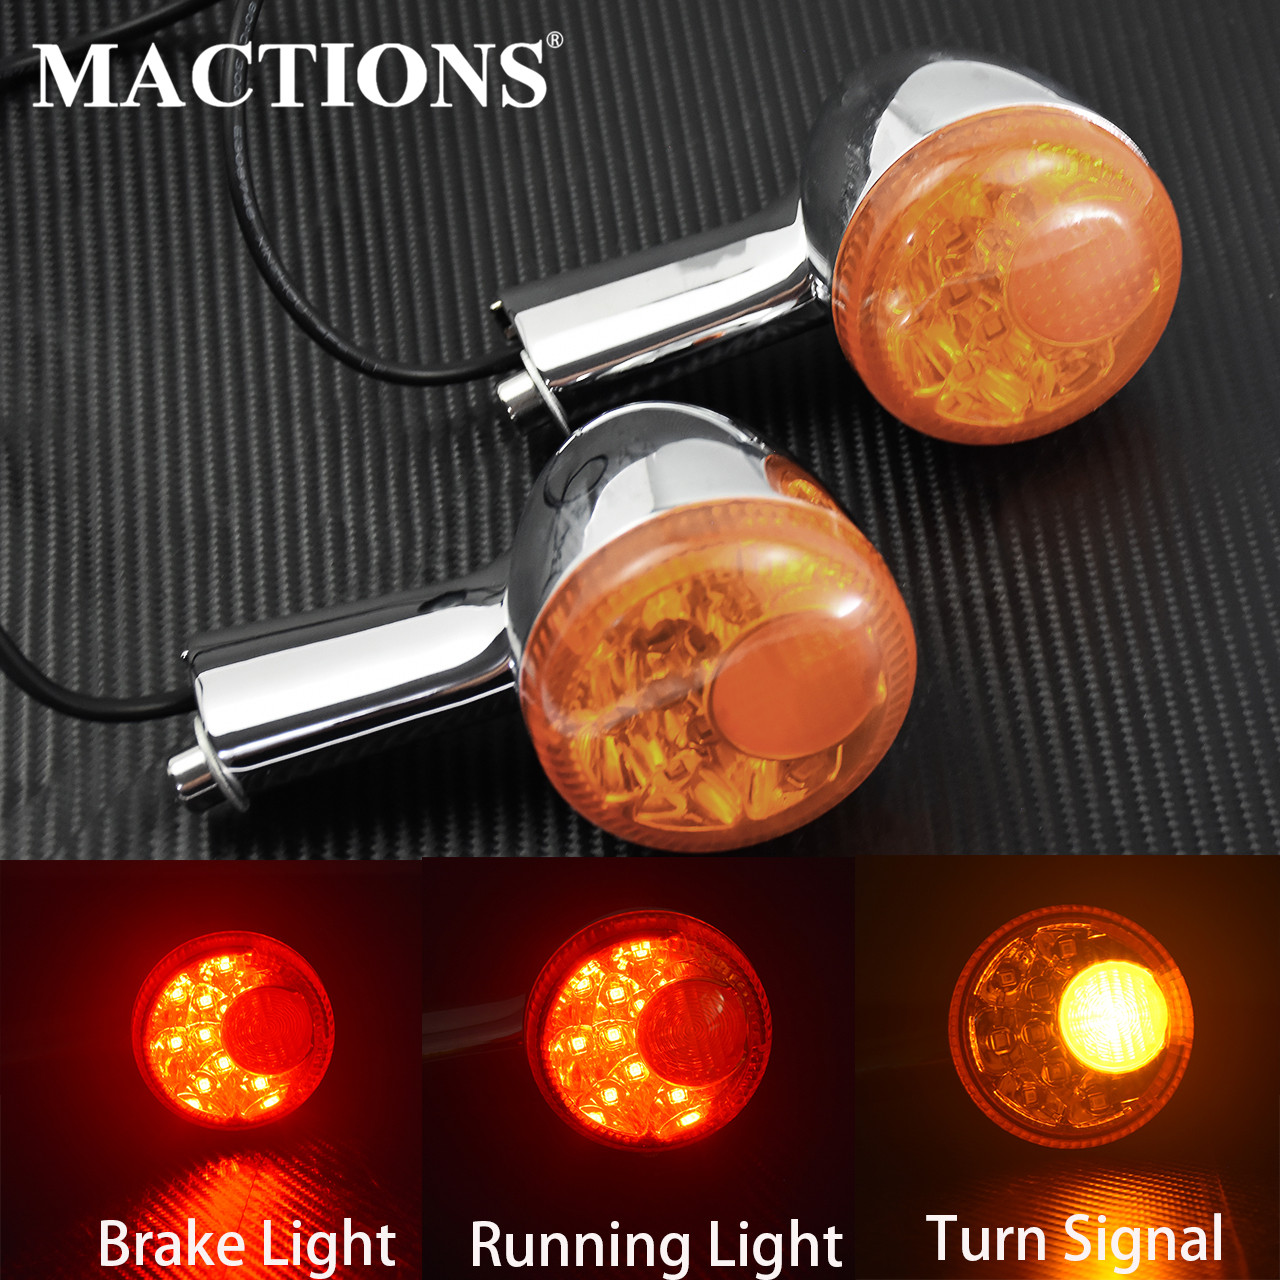 Motorcycle Amber Rear Turn Signal LED Indicator Light Brake Light Taillight Case For Harley Sportster 883 1200 XL 1992-14 15 16